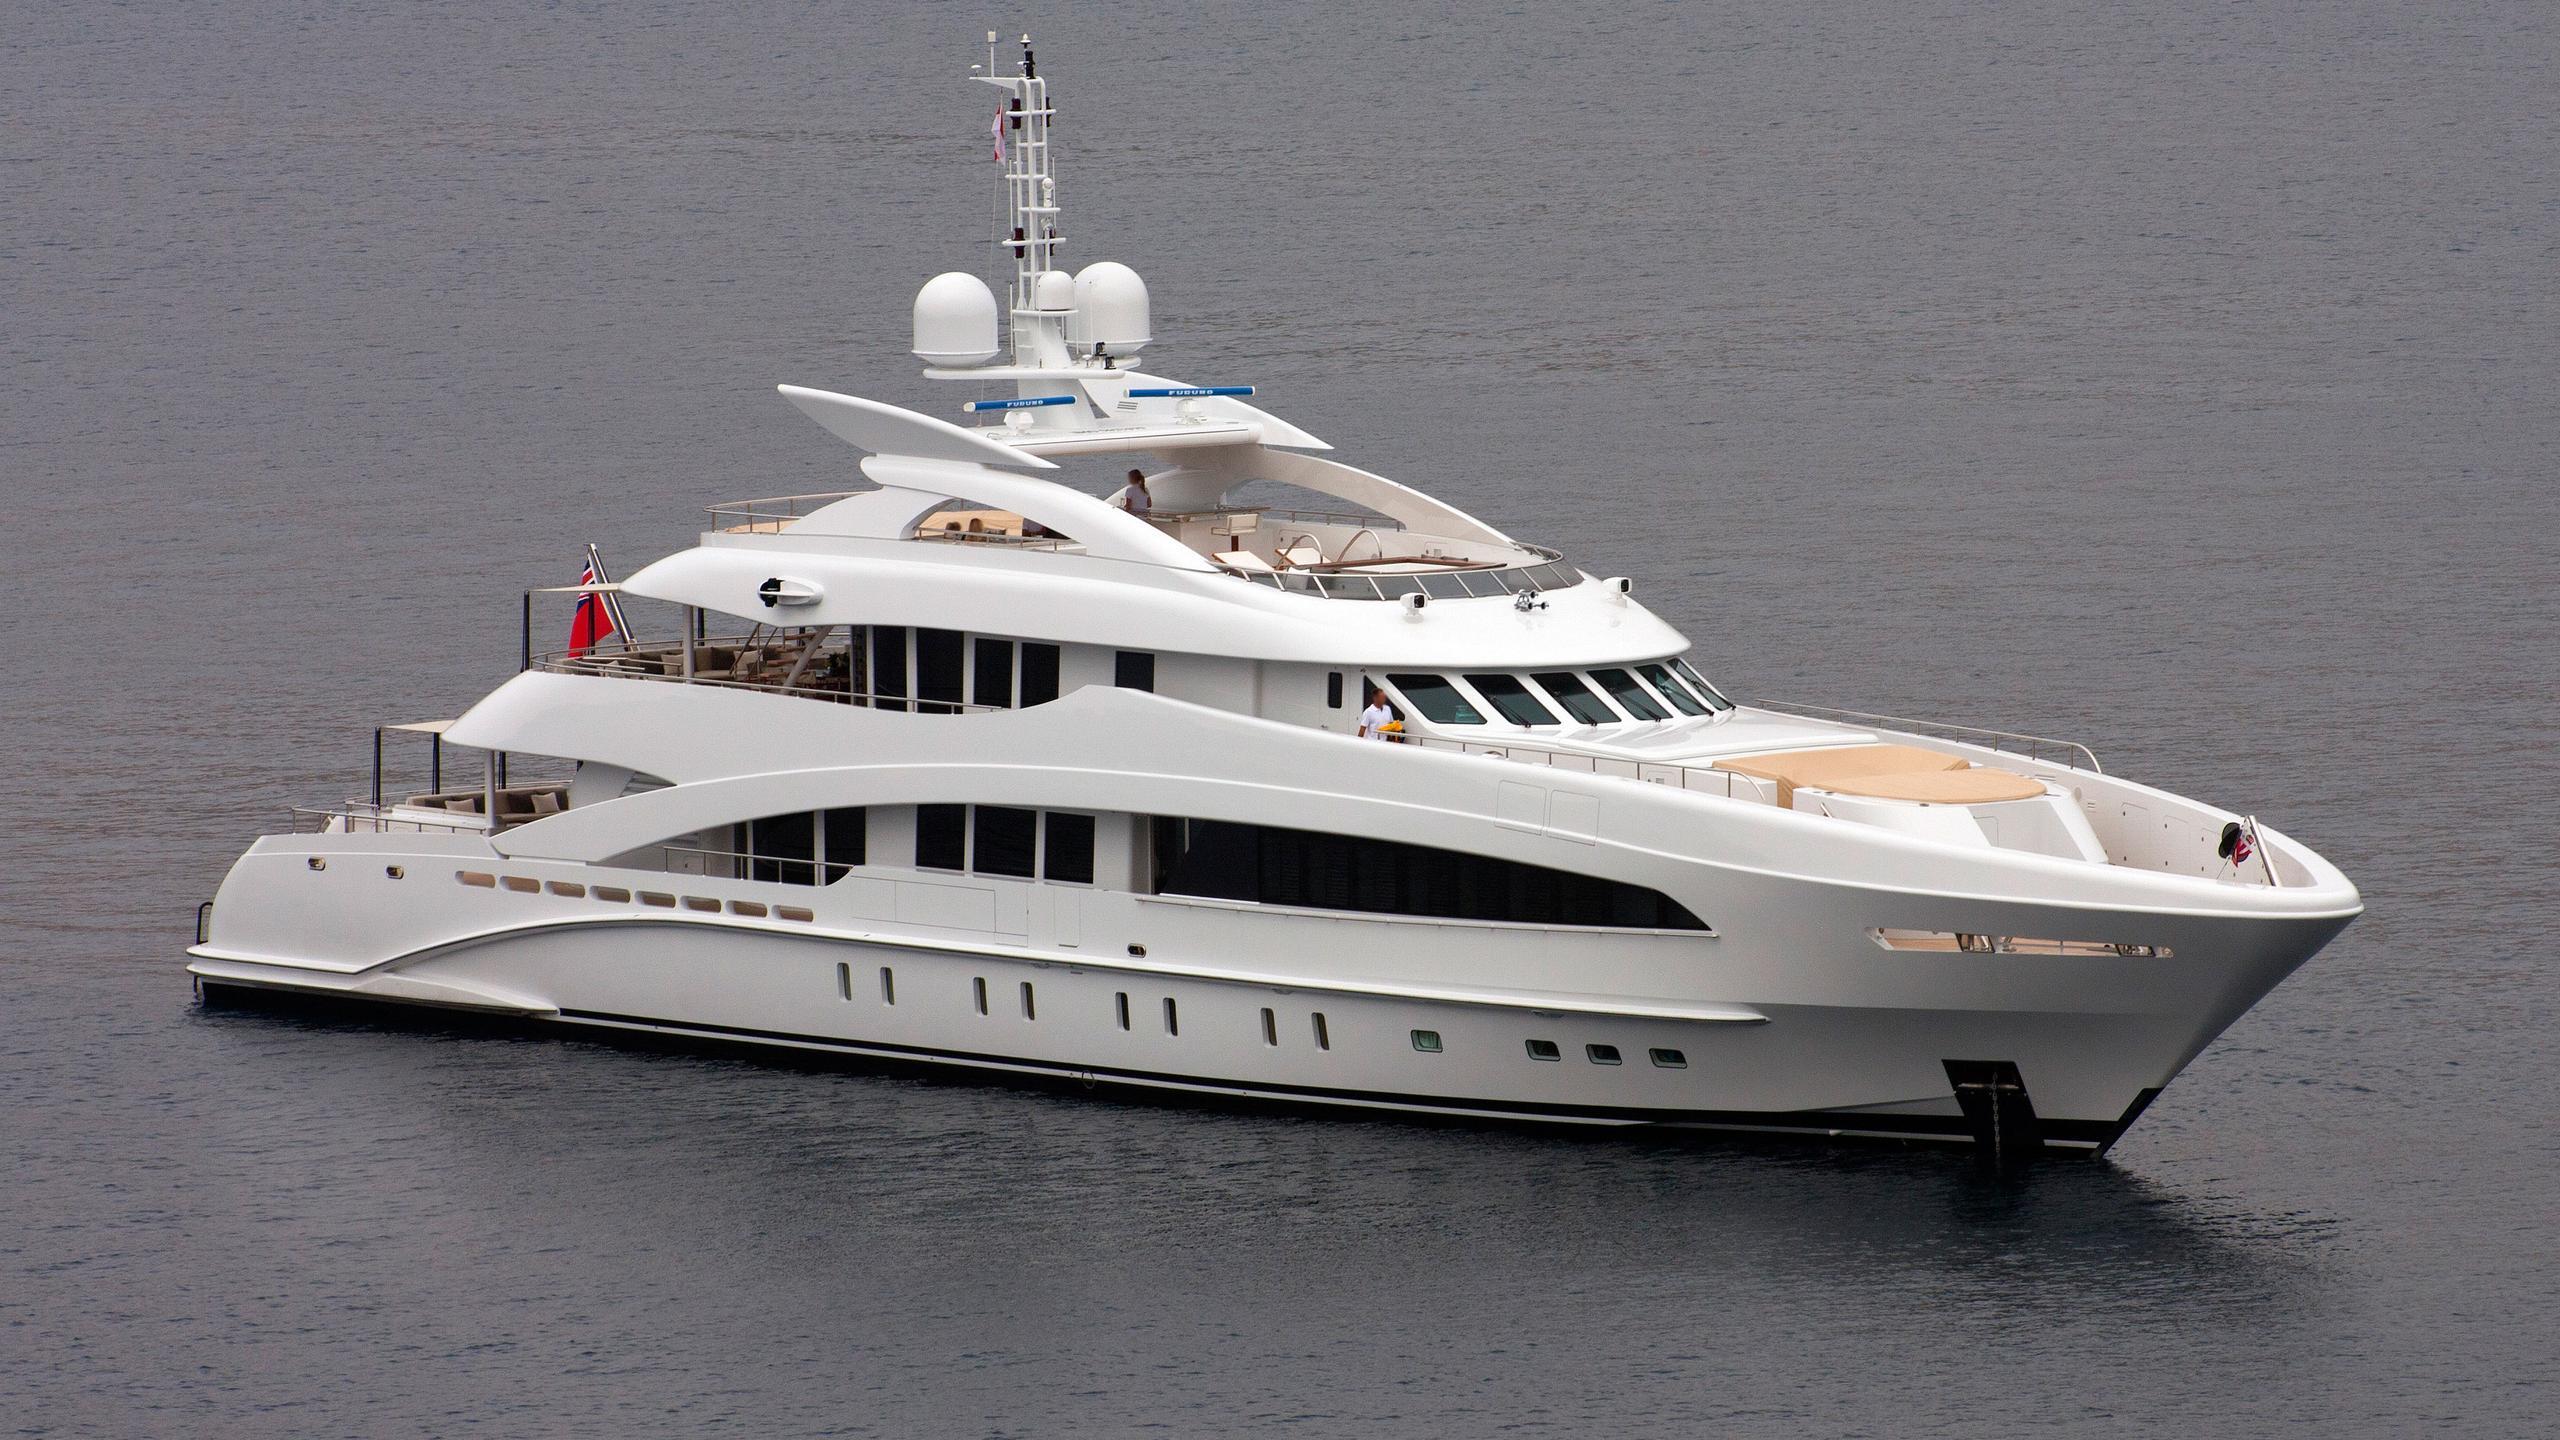 septimus-motor-yacht-heesen-2011-50m-half-profile